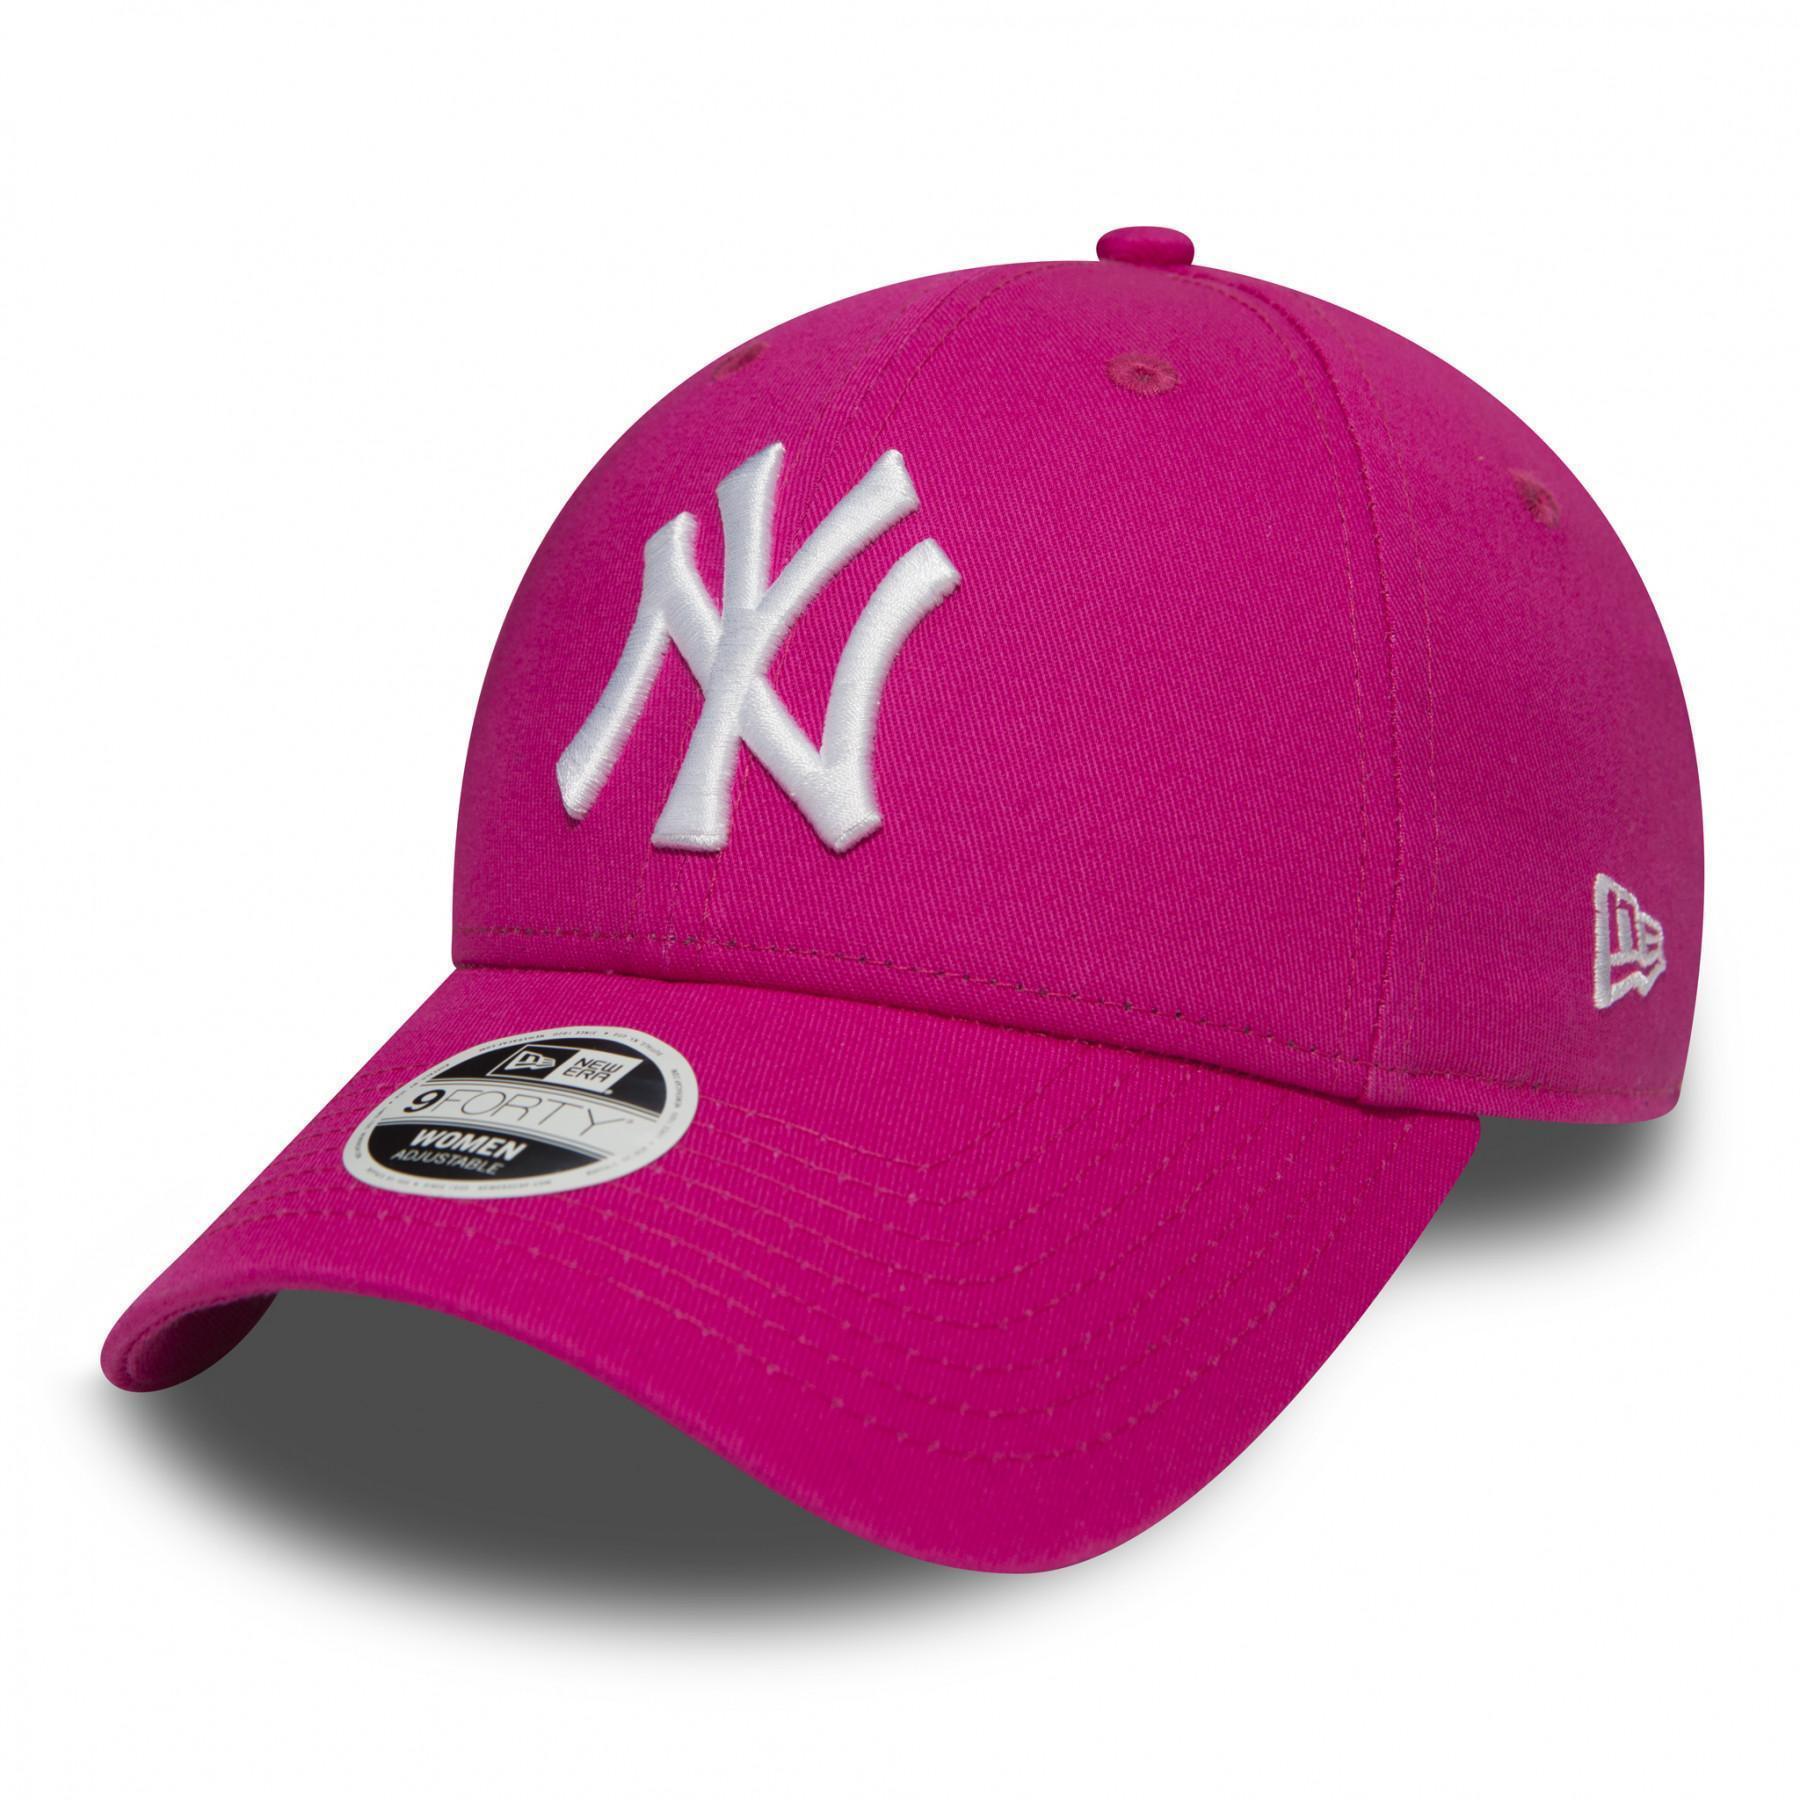 Cap New Era Cap New Era pink woman Fashion essential 9forty New York Yankees